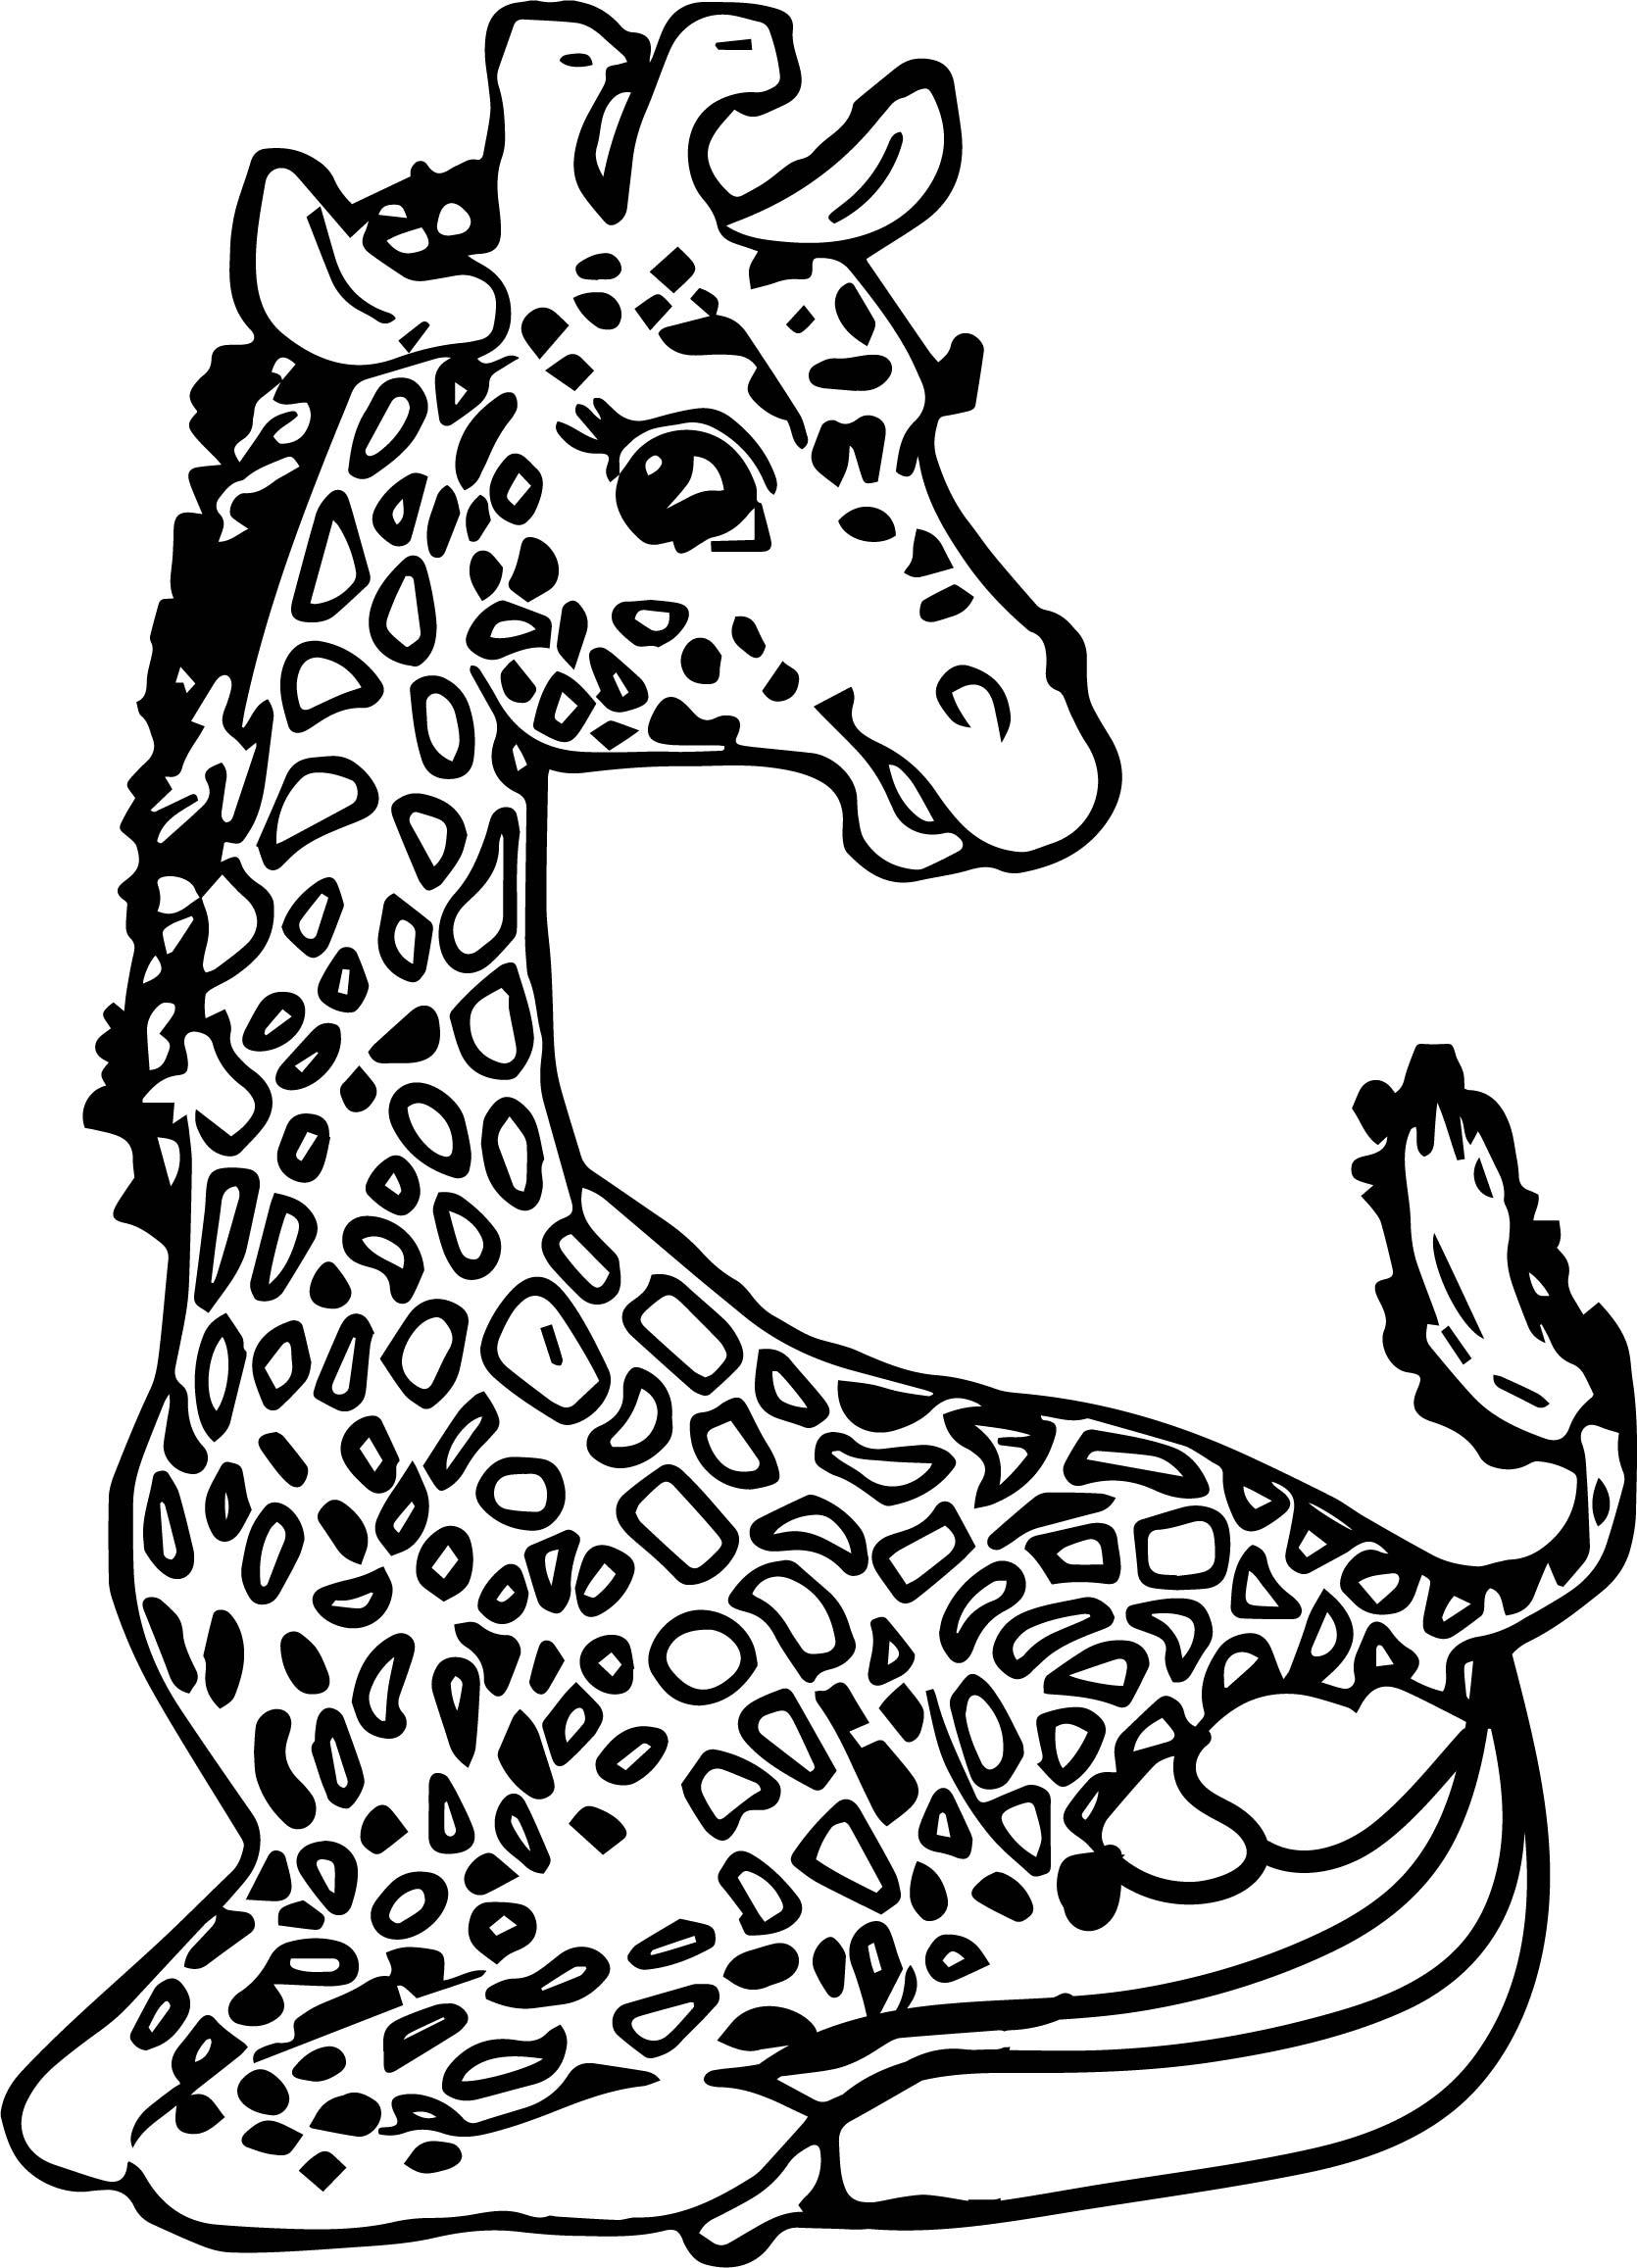 Giraffe Suprise Coloring Page